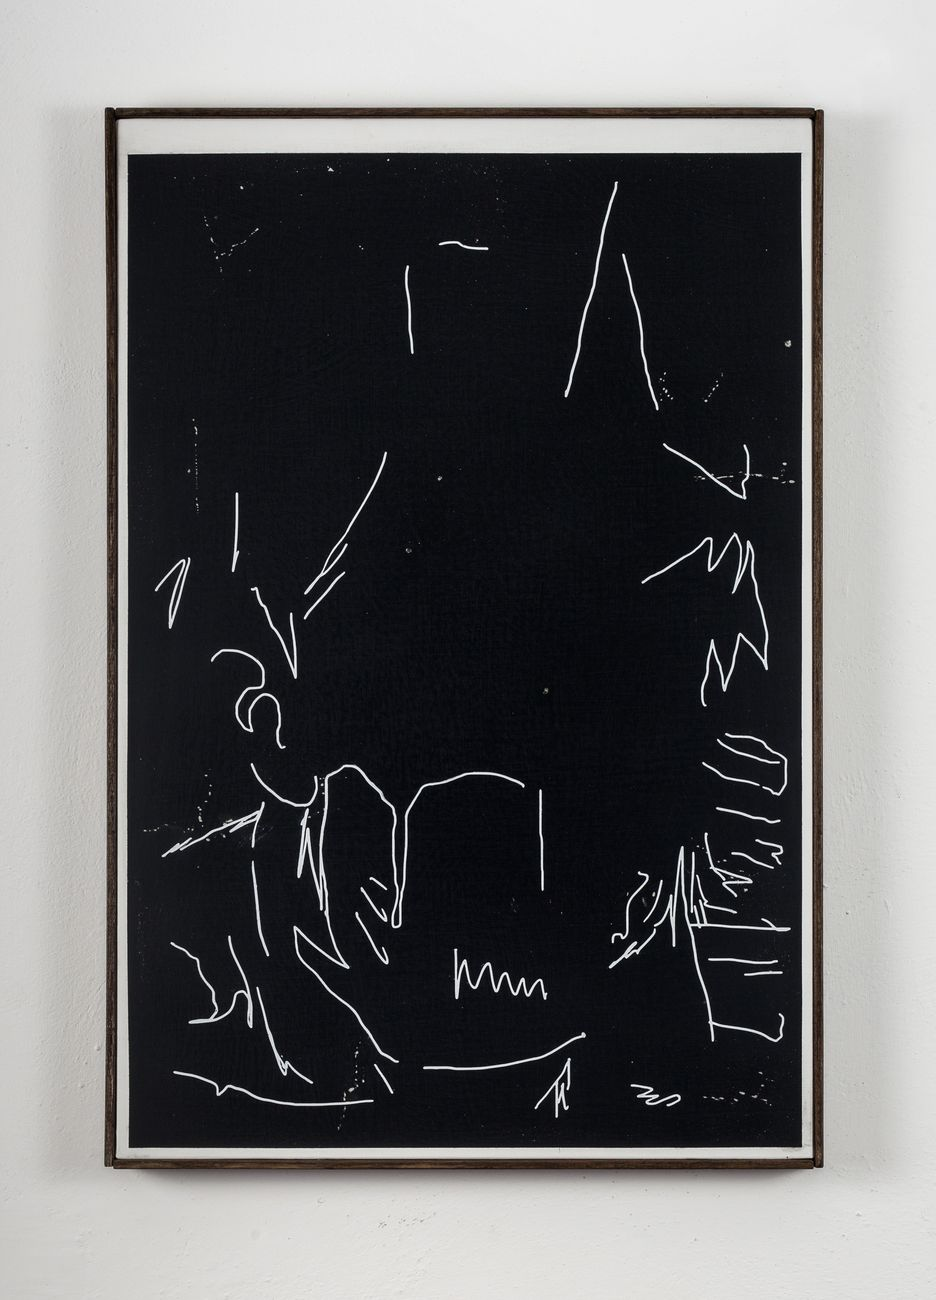 Andrea Carpita, Minimum Portrait (Selfportrait from a painting), 2017